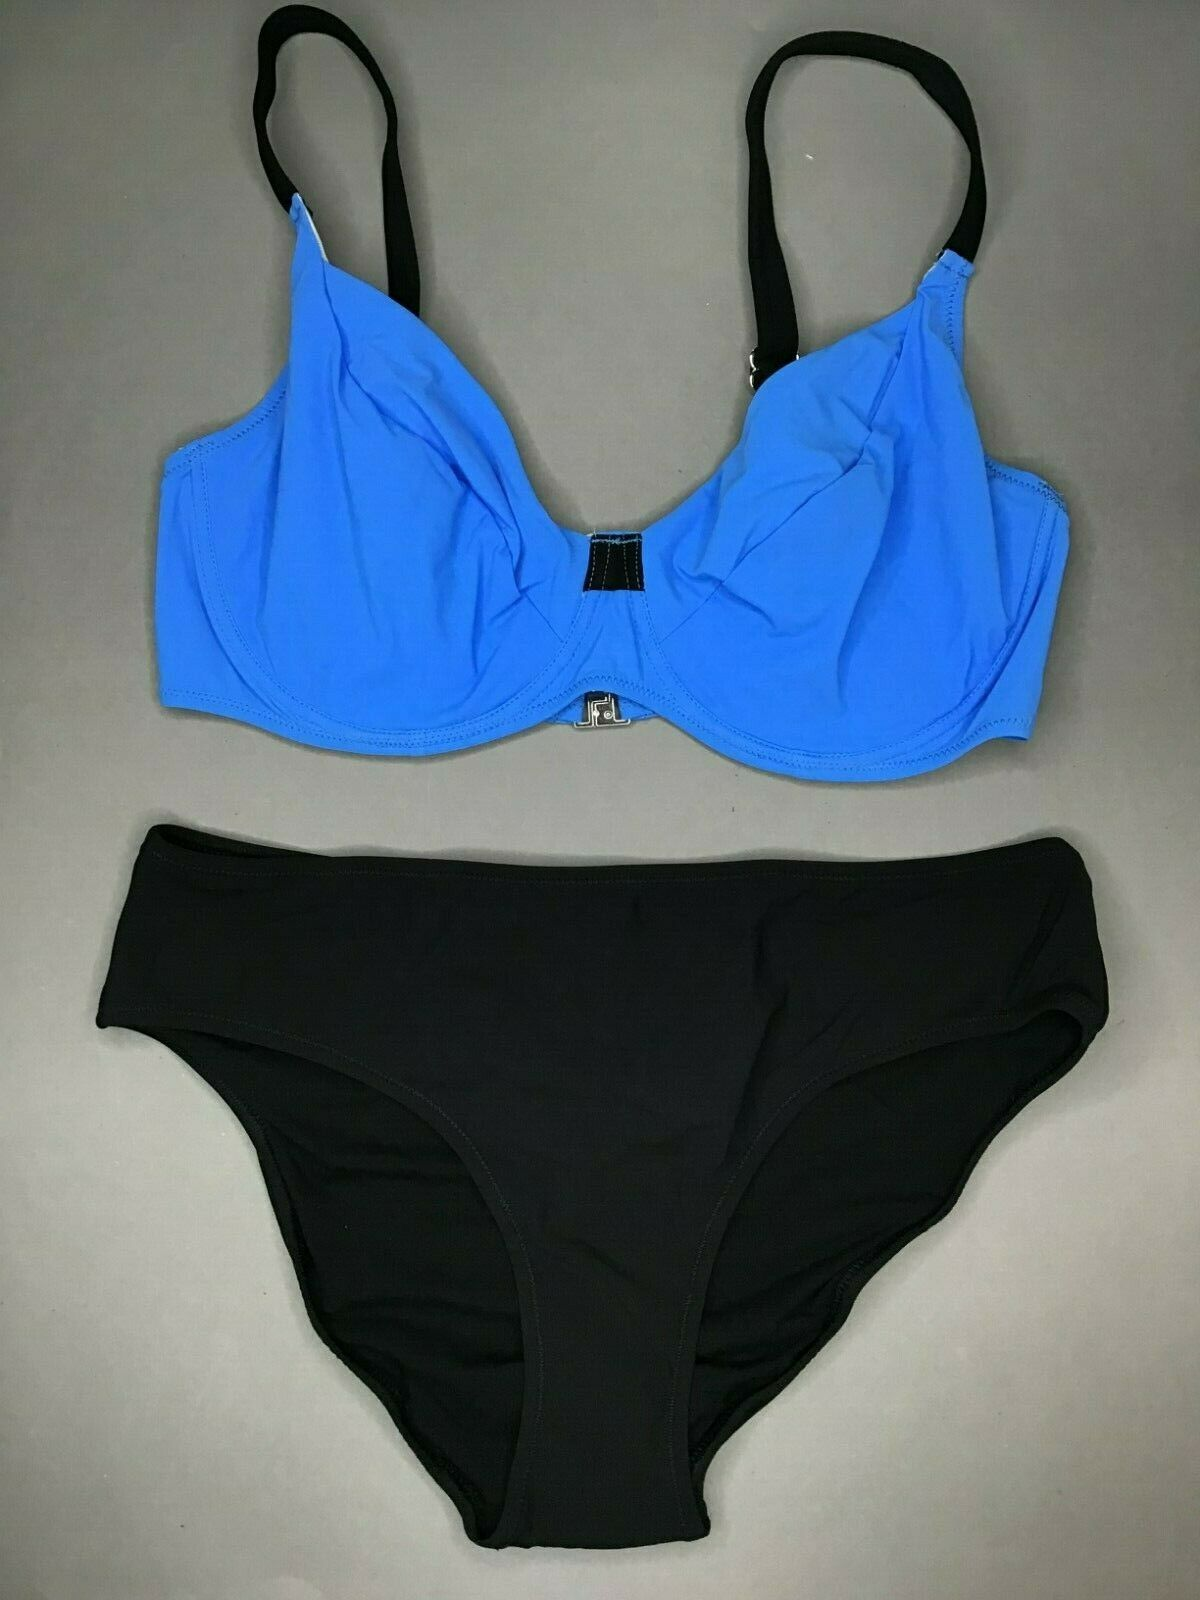 Jolidon Womens Bikini Set F2465 ungepolstert UNDERWIRED BLACK/BLUE NEW